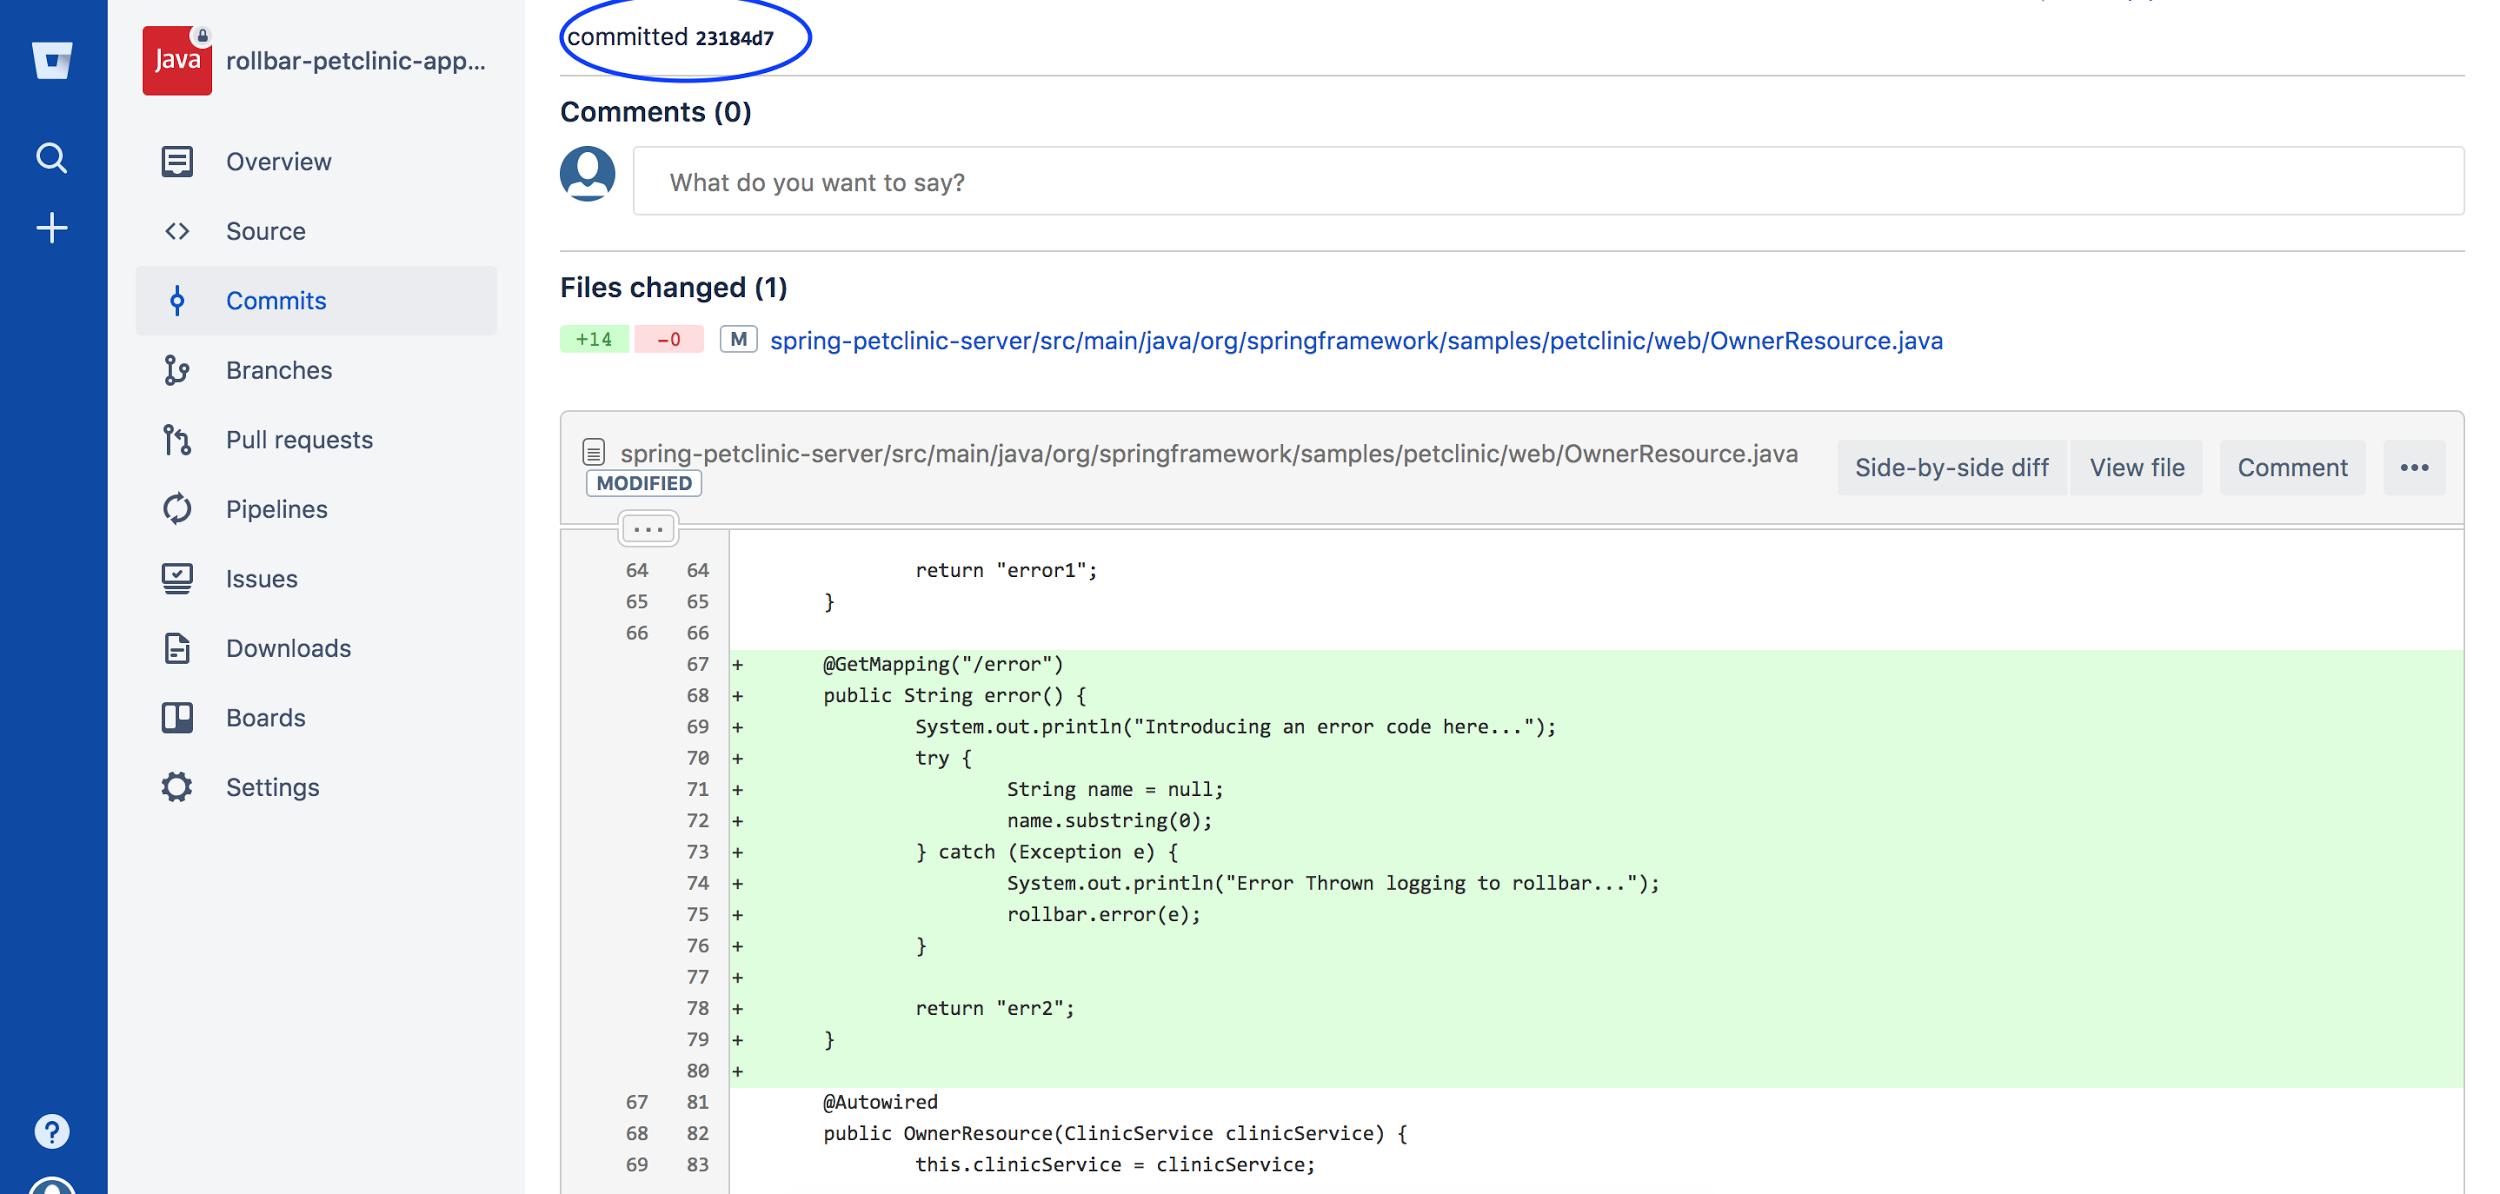 Screenshot of Rollbar deployed notification